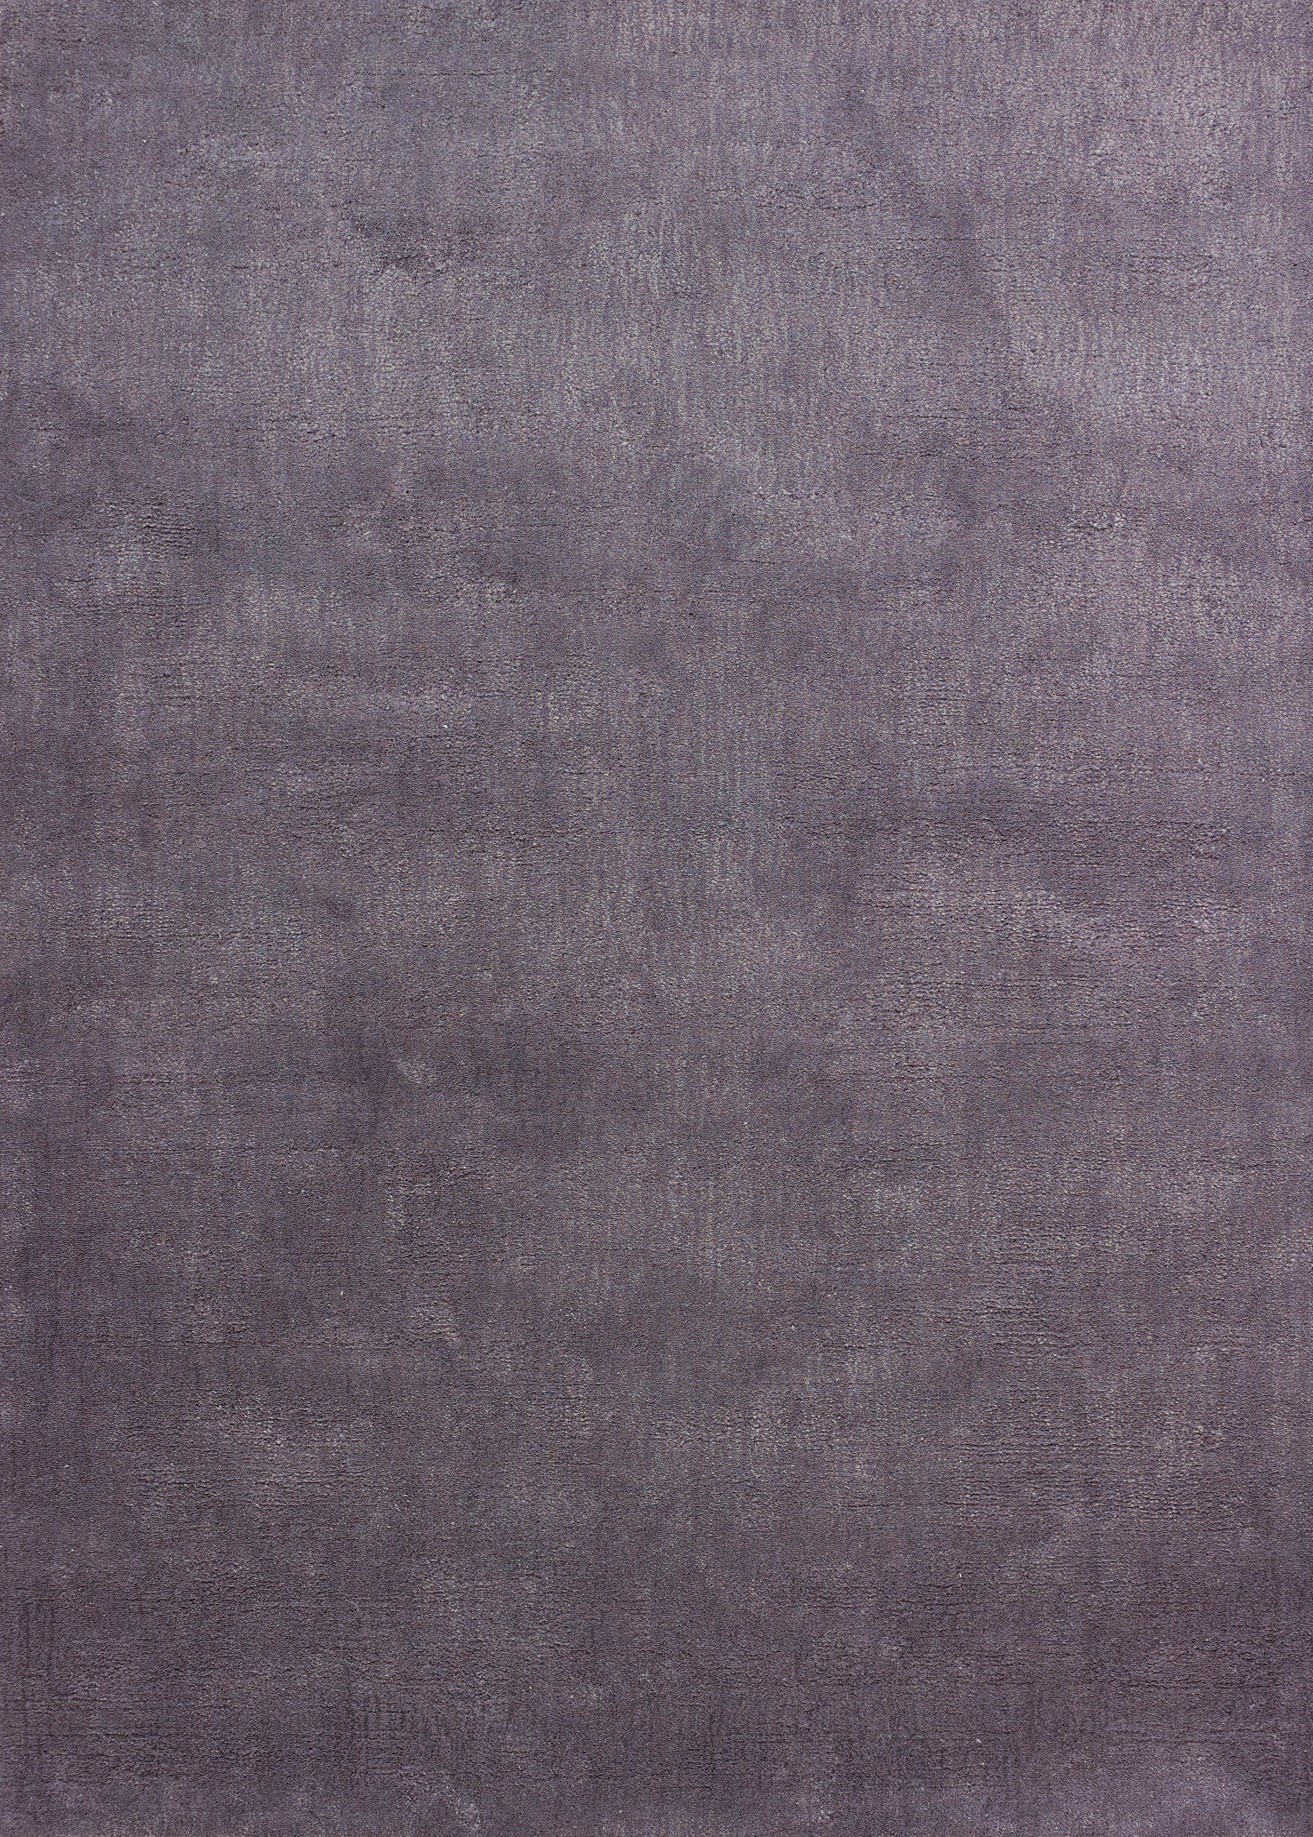 Speckle Handloom Wool Rug (Colour: Warm Grey, Rug Size: 160 x 220)